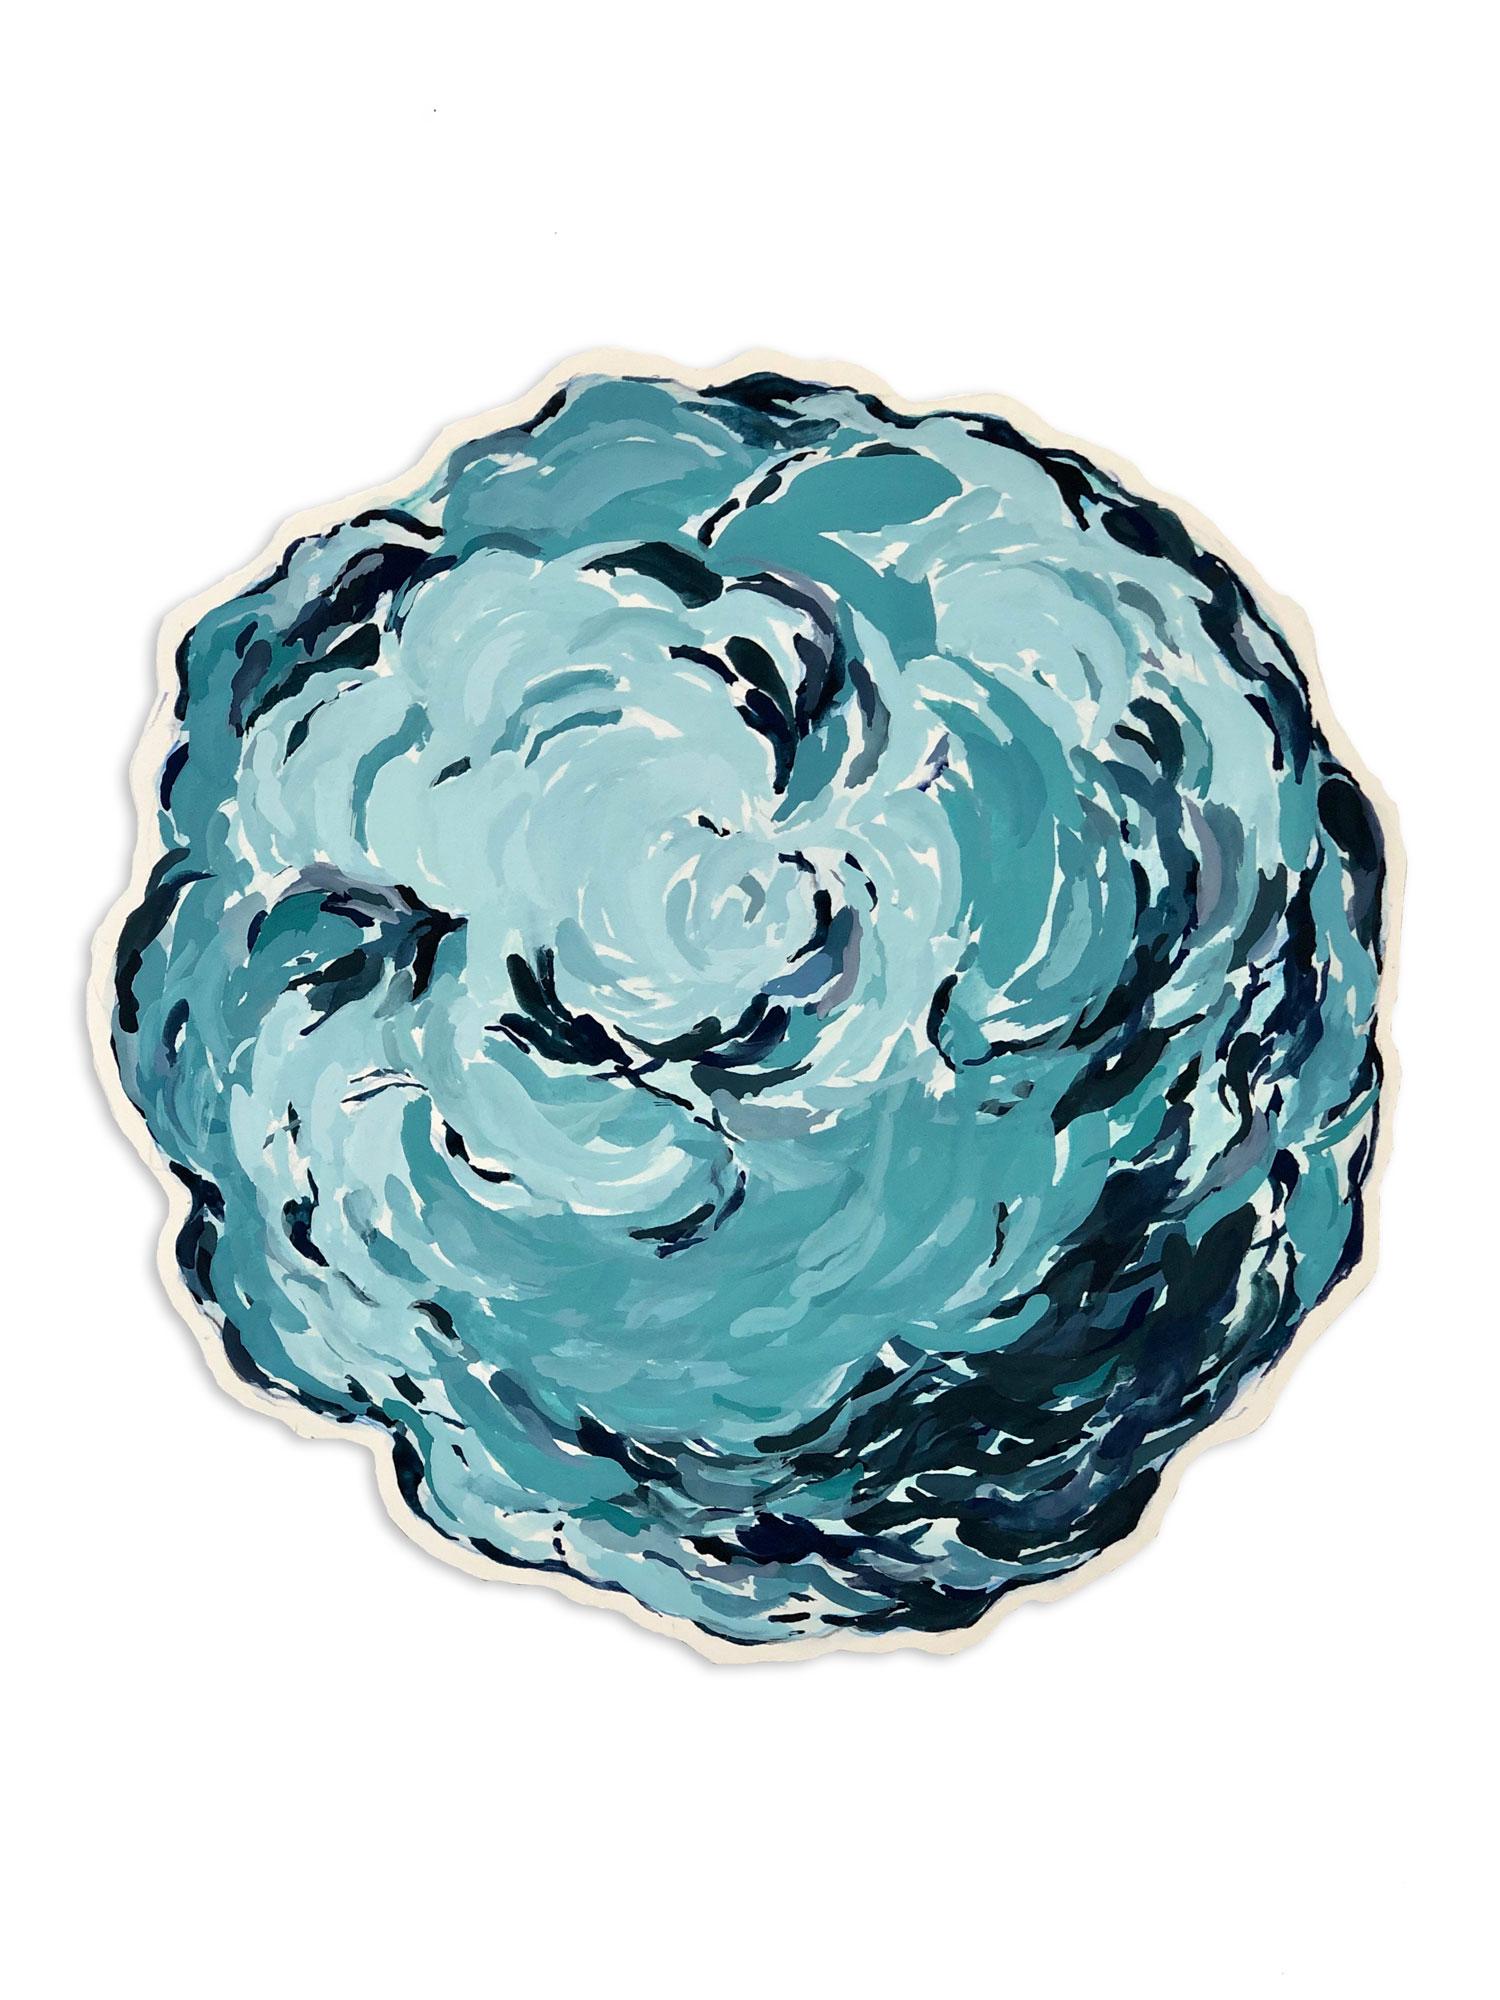 Untitled (Teal Blue)